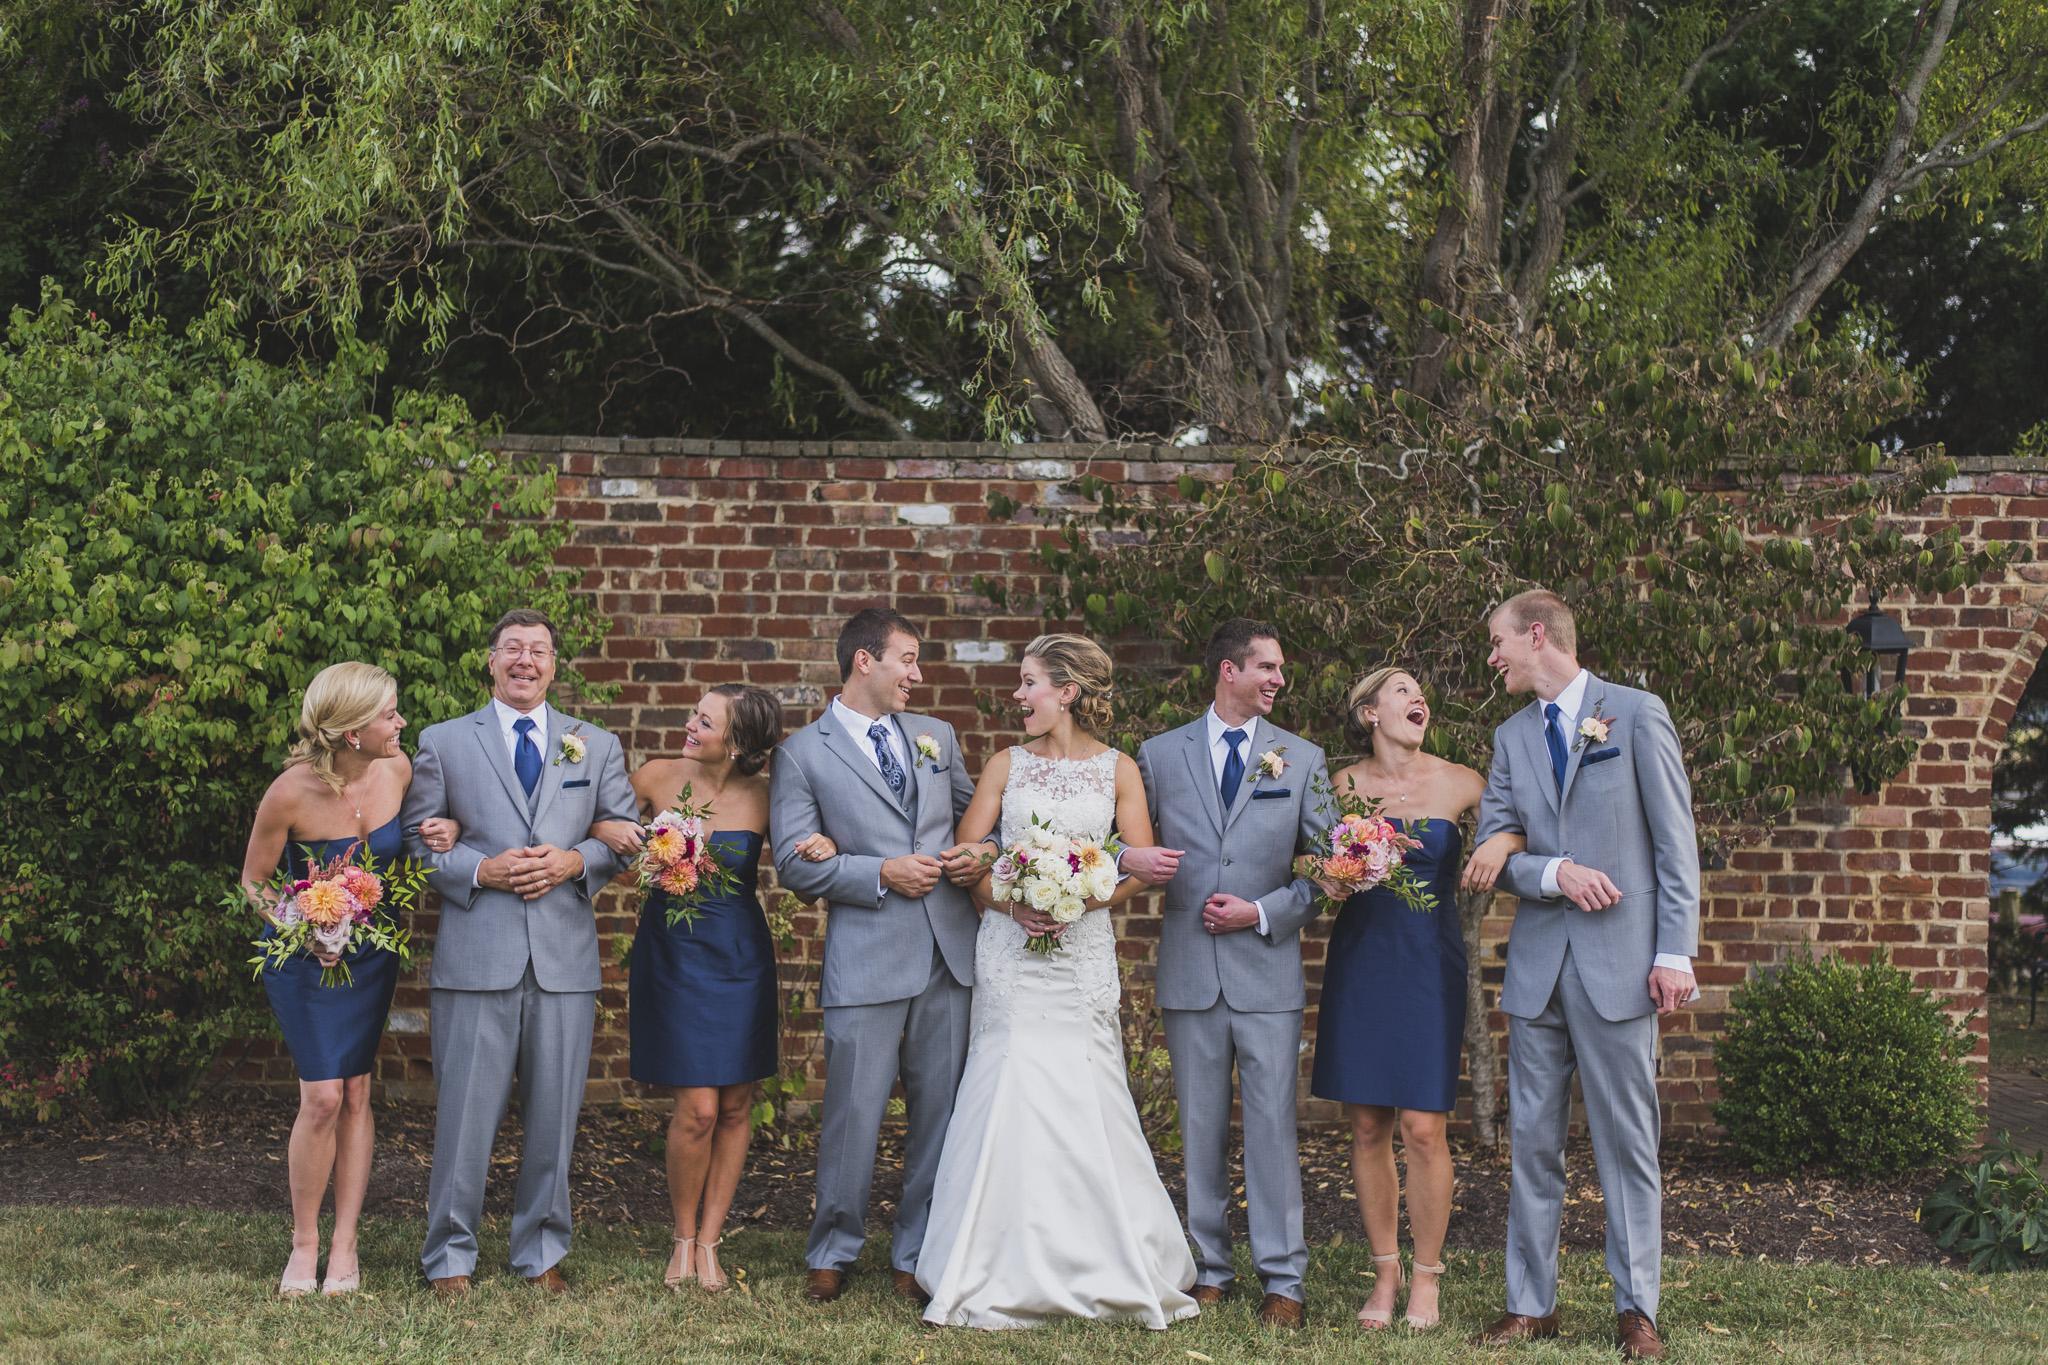 West Manor Wedding_Lynchburg VA_Classic_Black tie_Forest VA_Wedding_photos2065.jpg